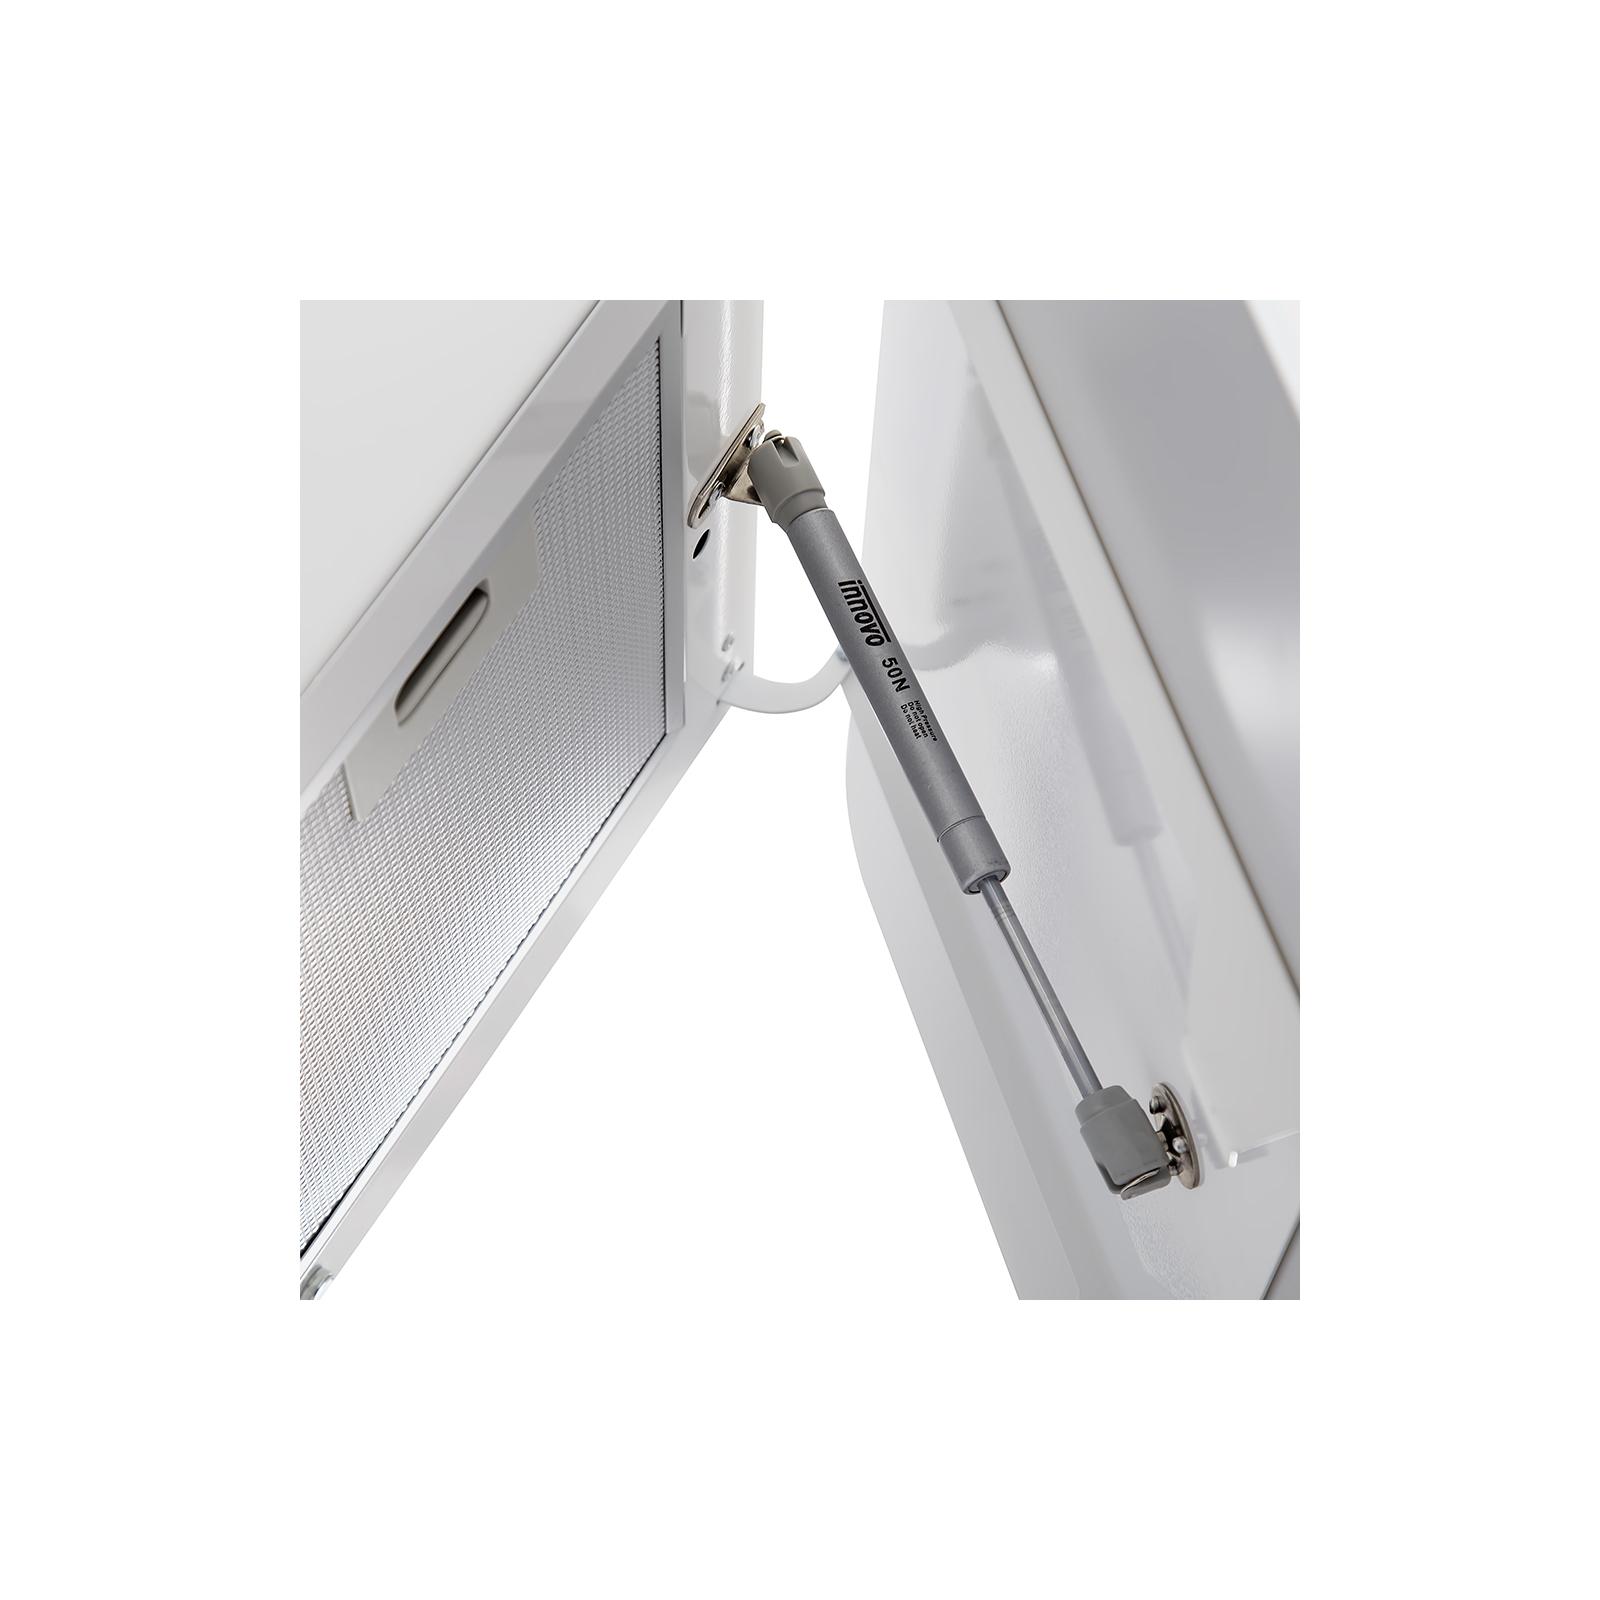 Вытяжка кухонная PERFELLI DNS 6114 BL LED изображение 4